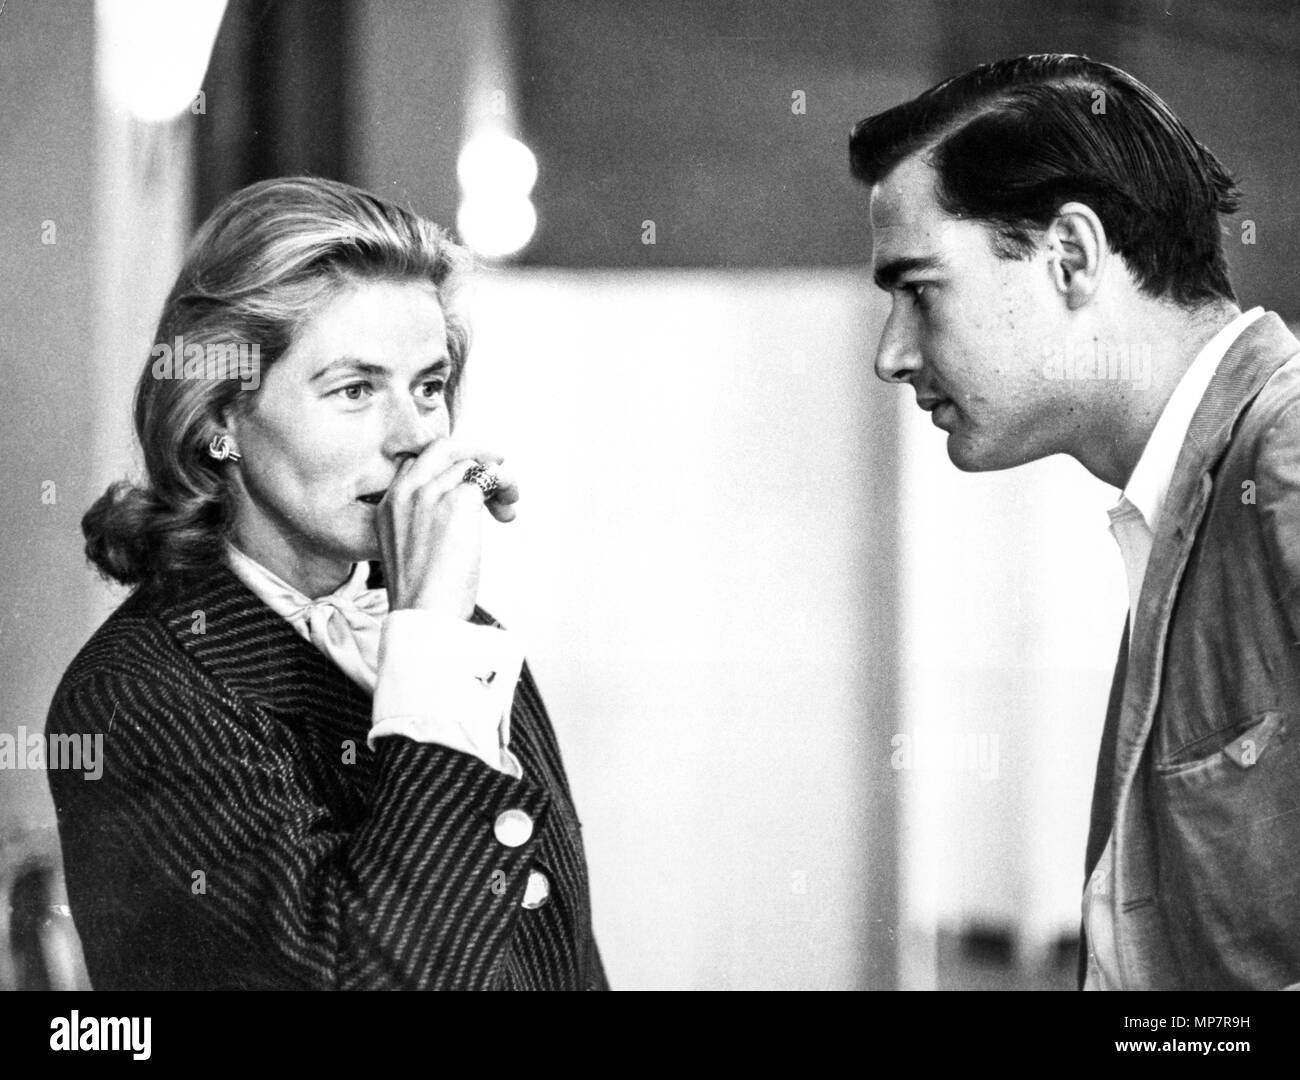 Ingrid Bergman, John Frankenheimer, le tour de vis, 1959 Photo Stock